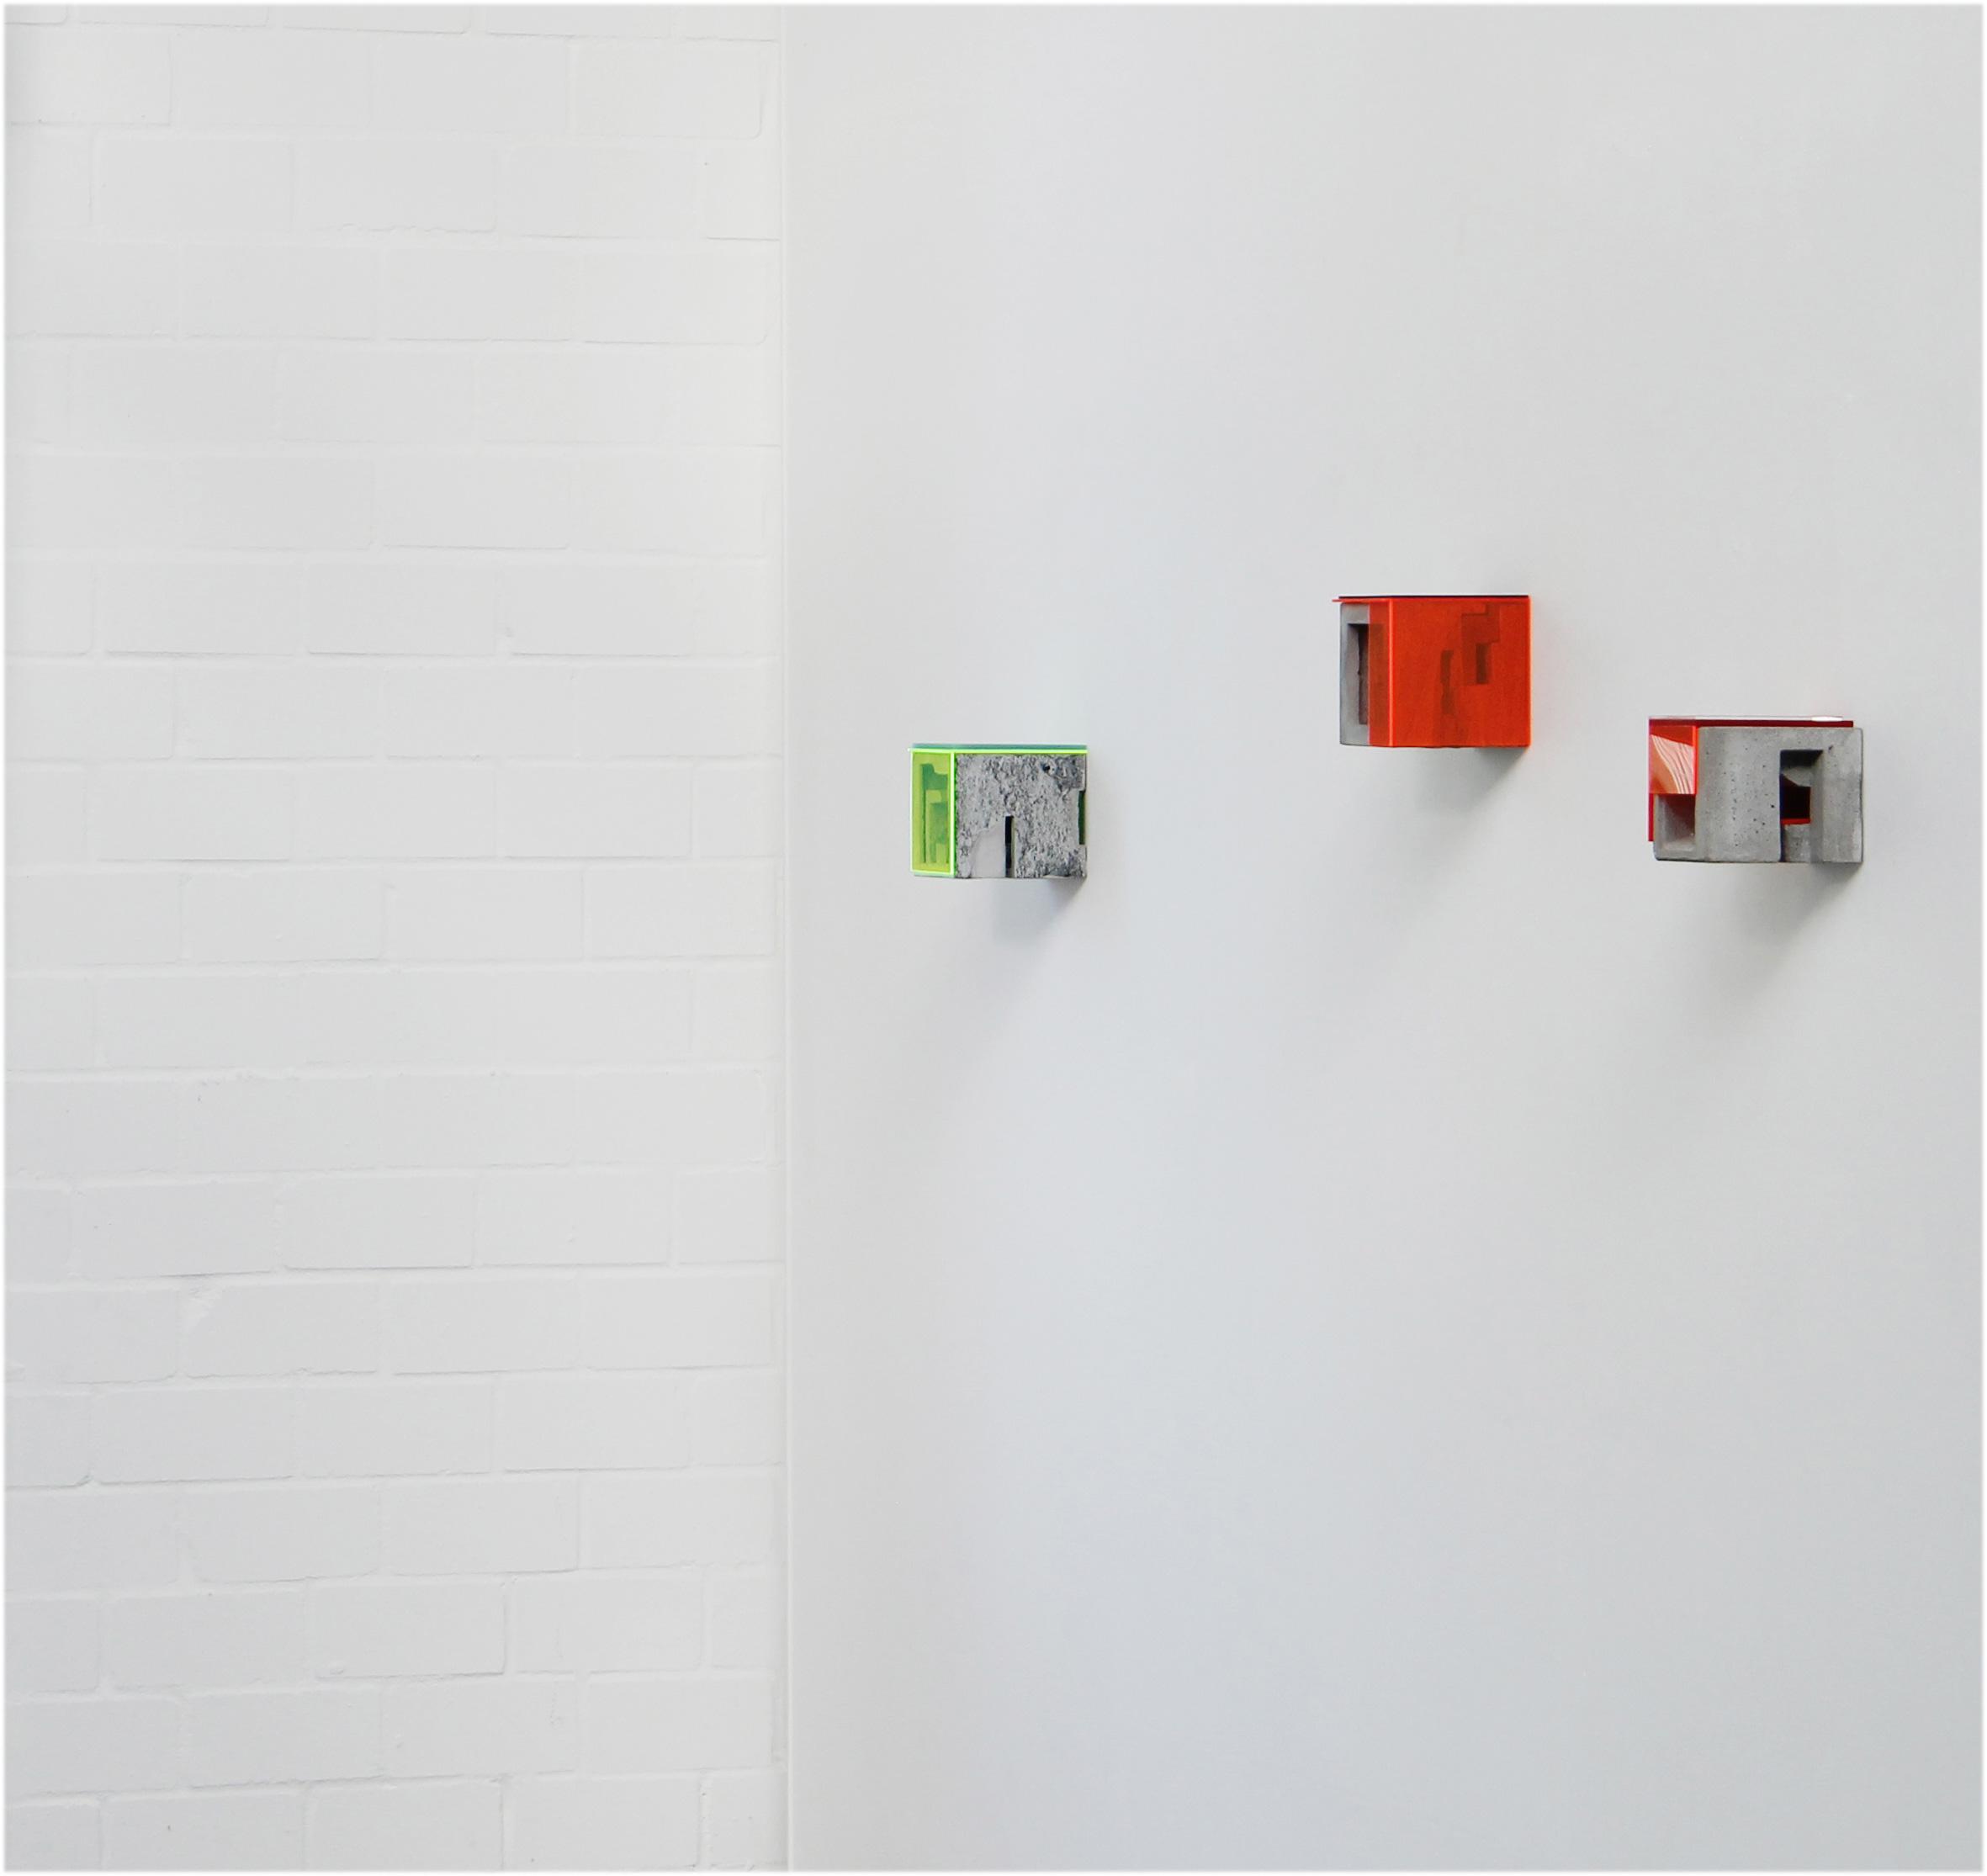 Box X/3, Box X/6, Box X/5 | 2019 | 15 x 15 x 14 cm Beton / Acrylglas